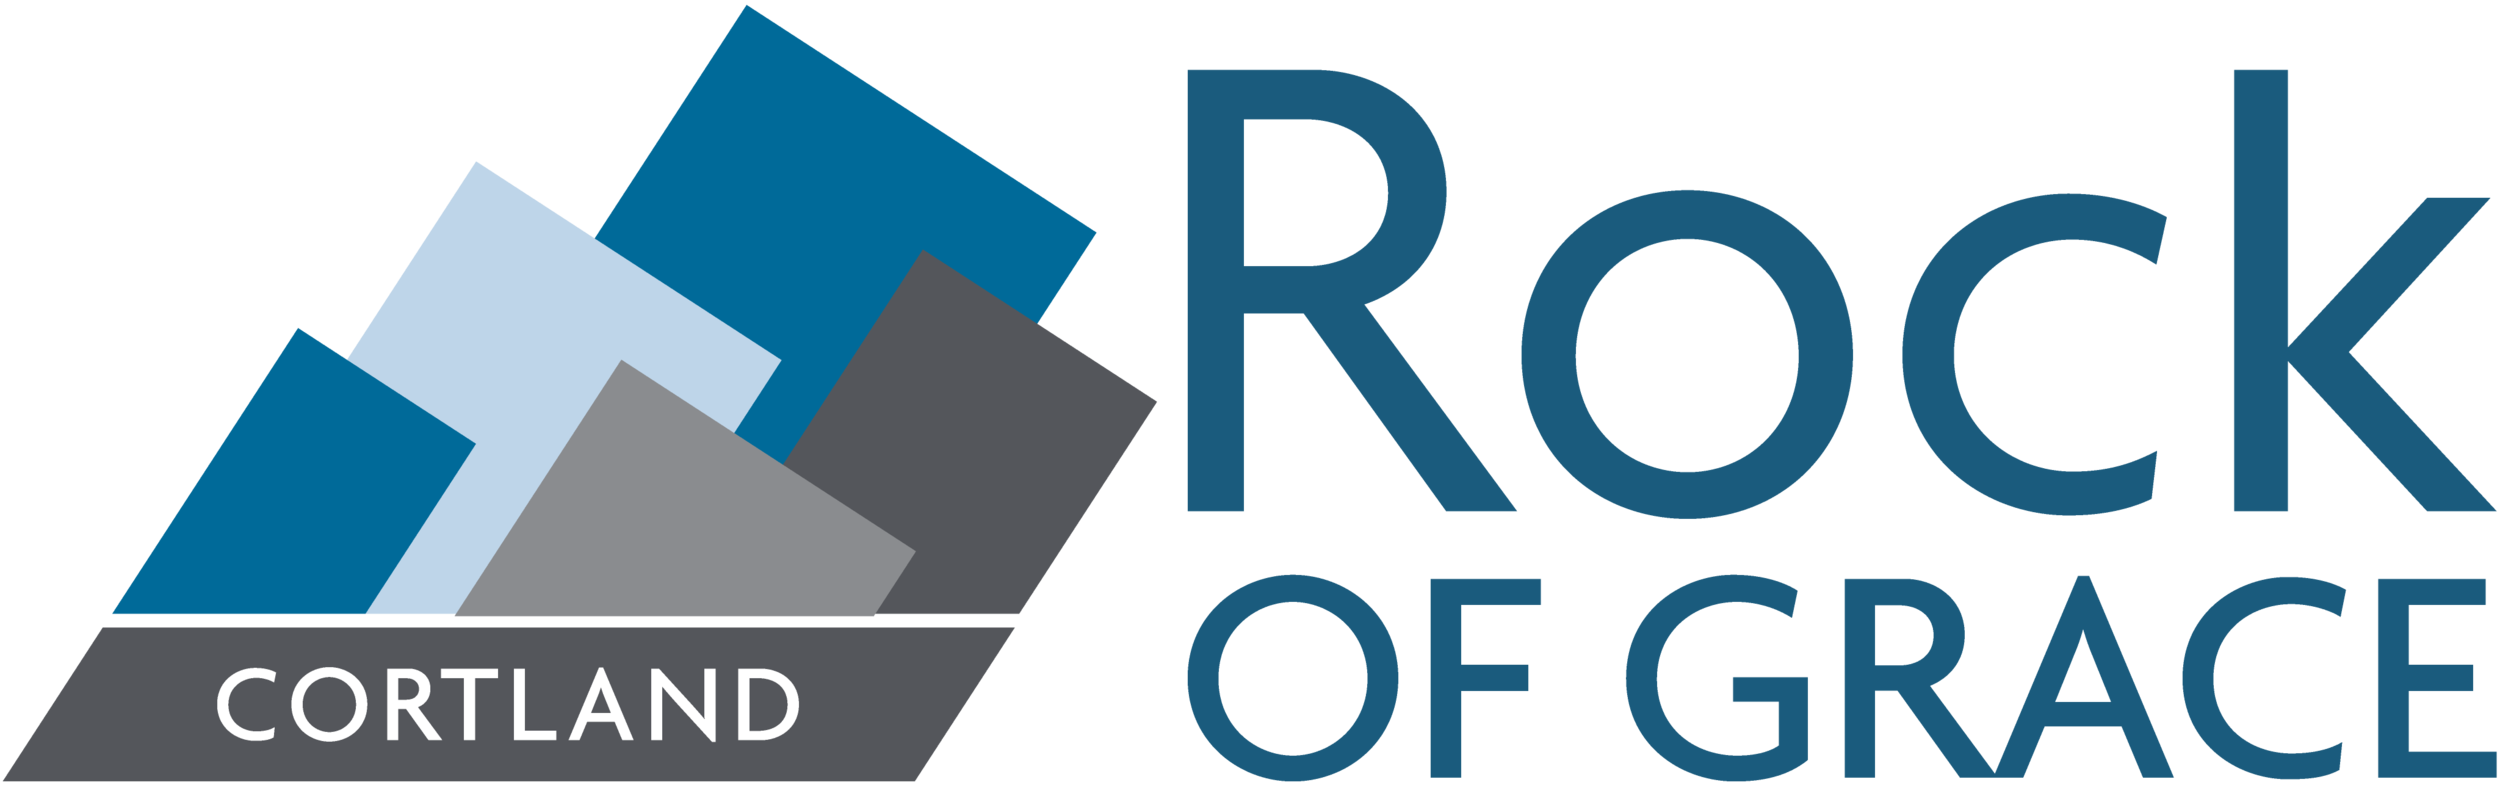 Rock-of-Grace-Logo-Cortland-onscreen.png